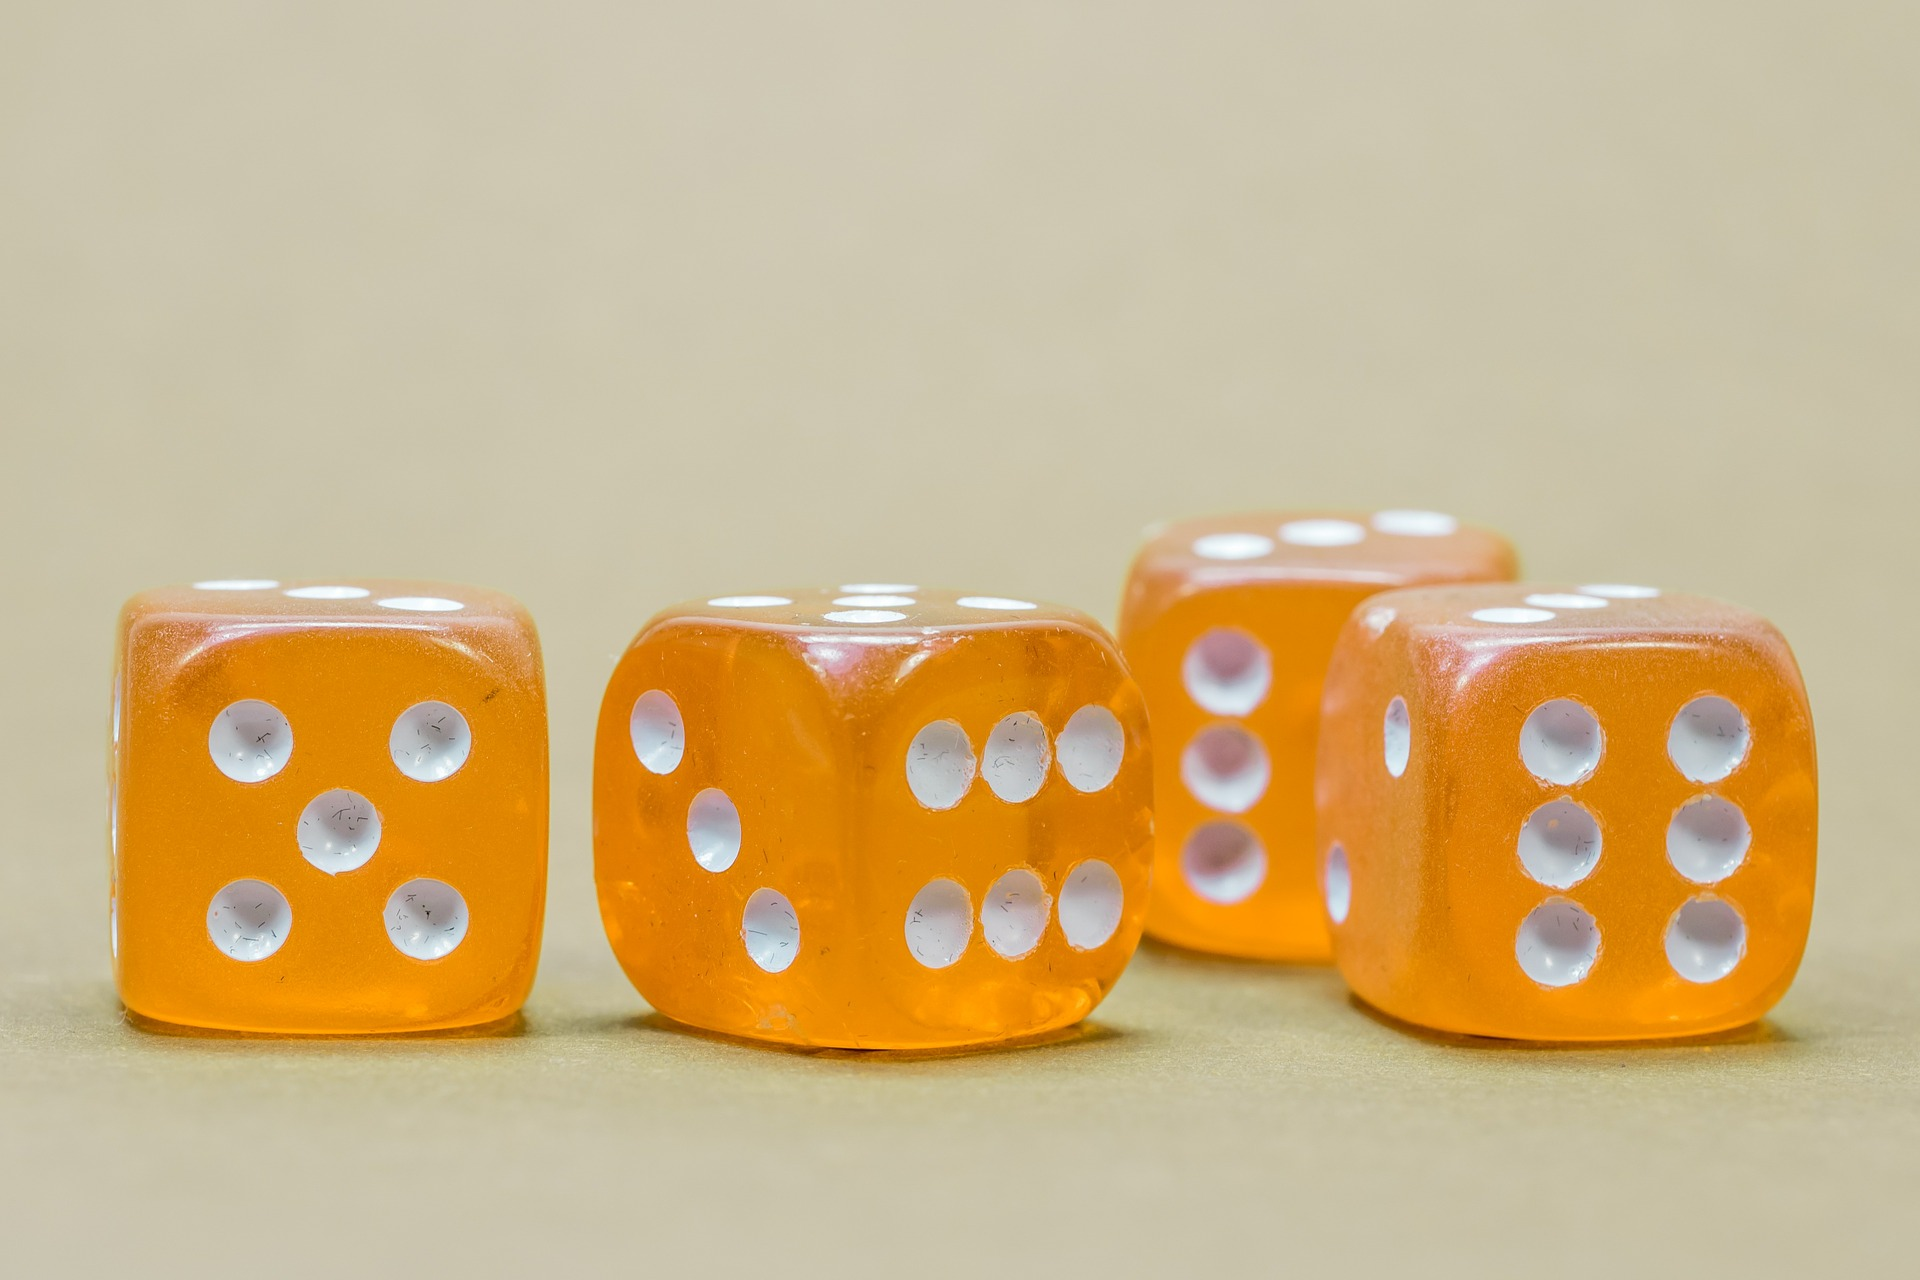 cube-568193_1920.jpg